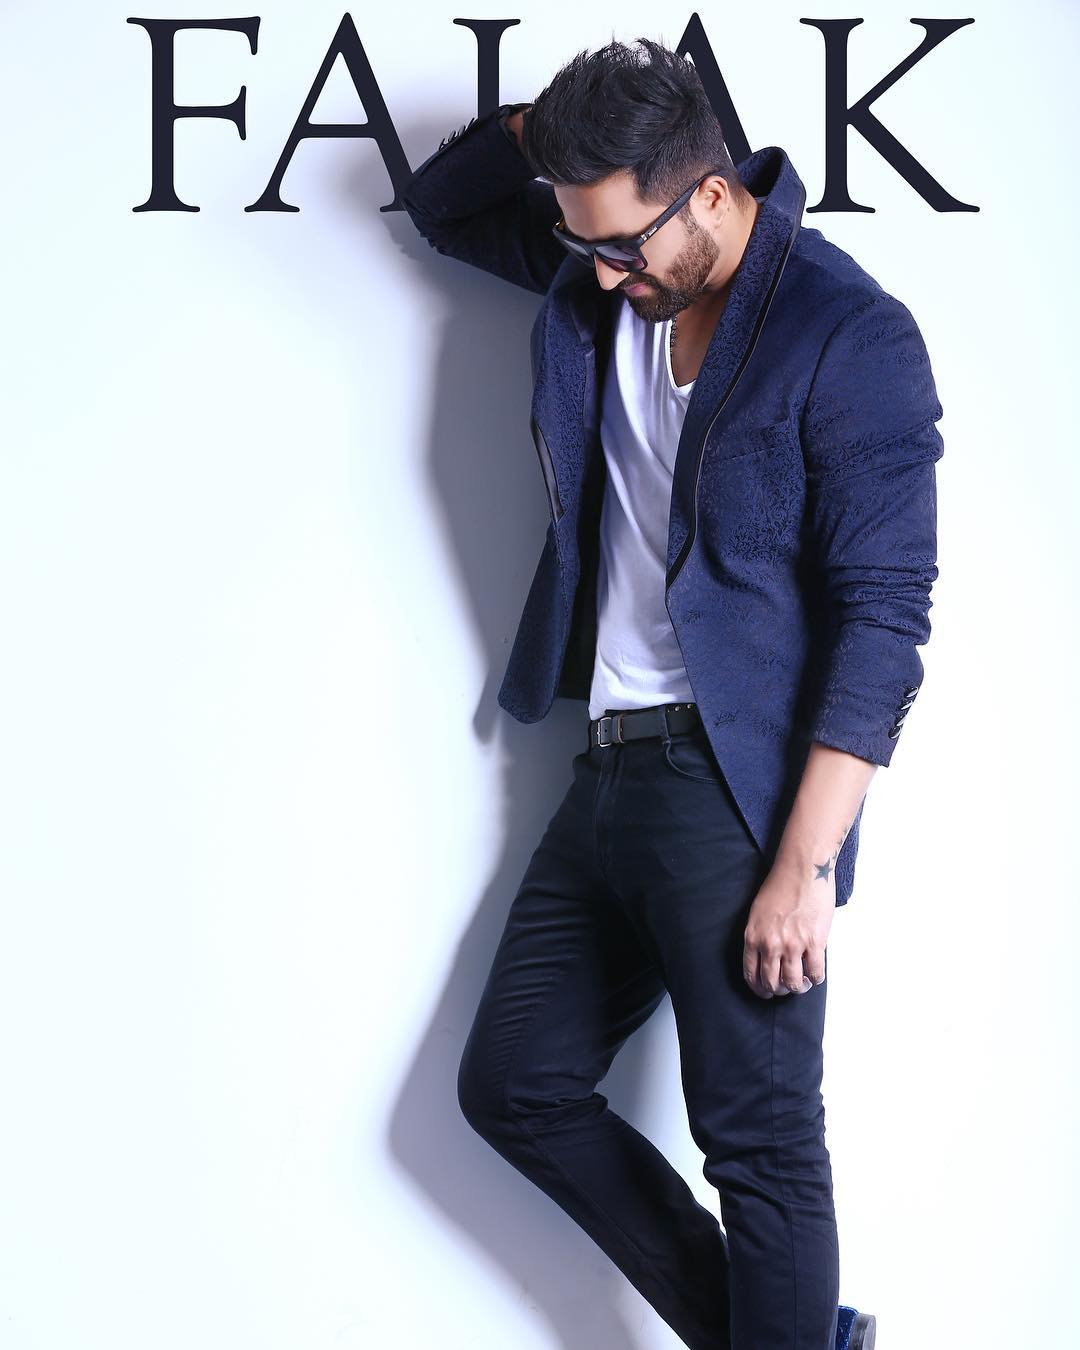 Falak Shabir images